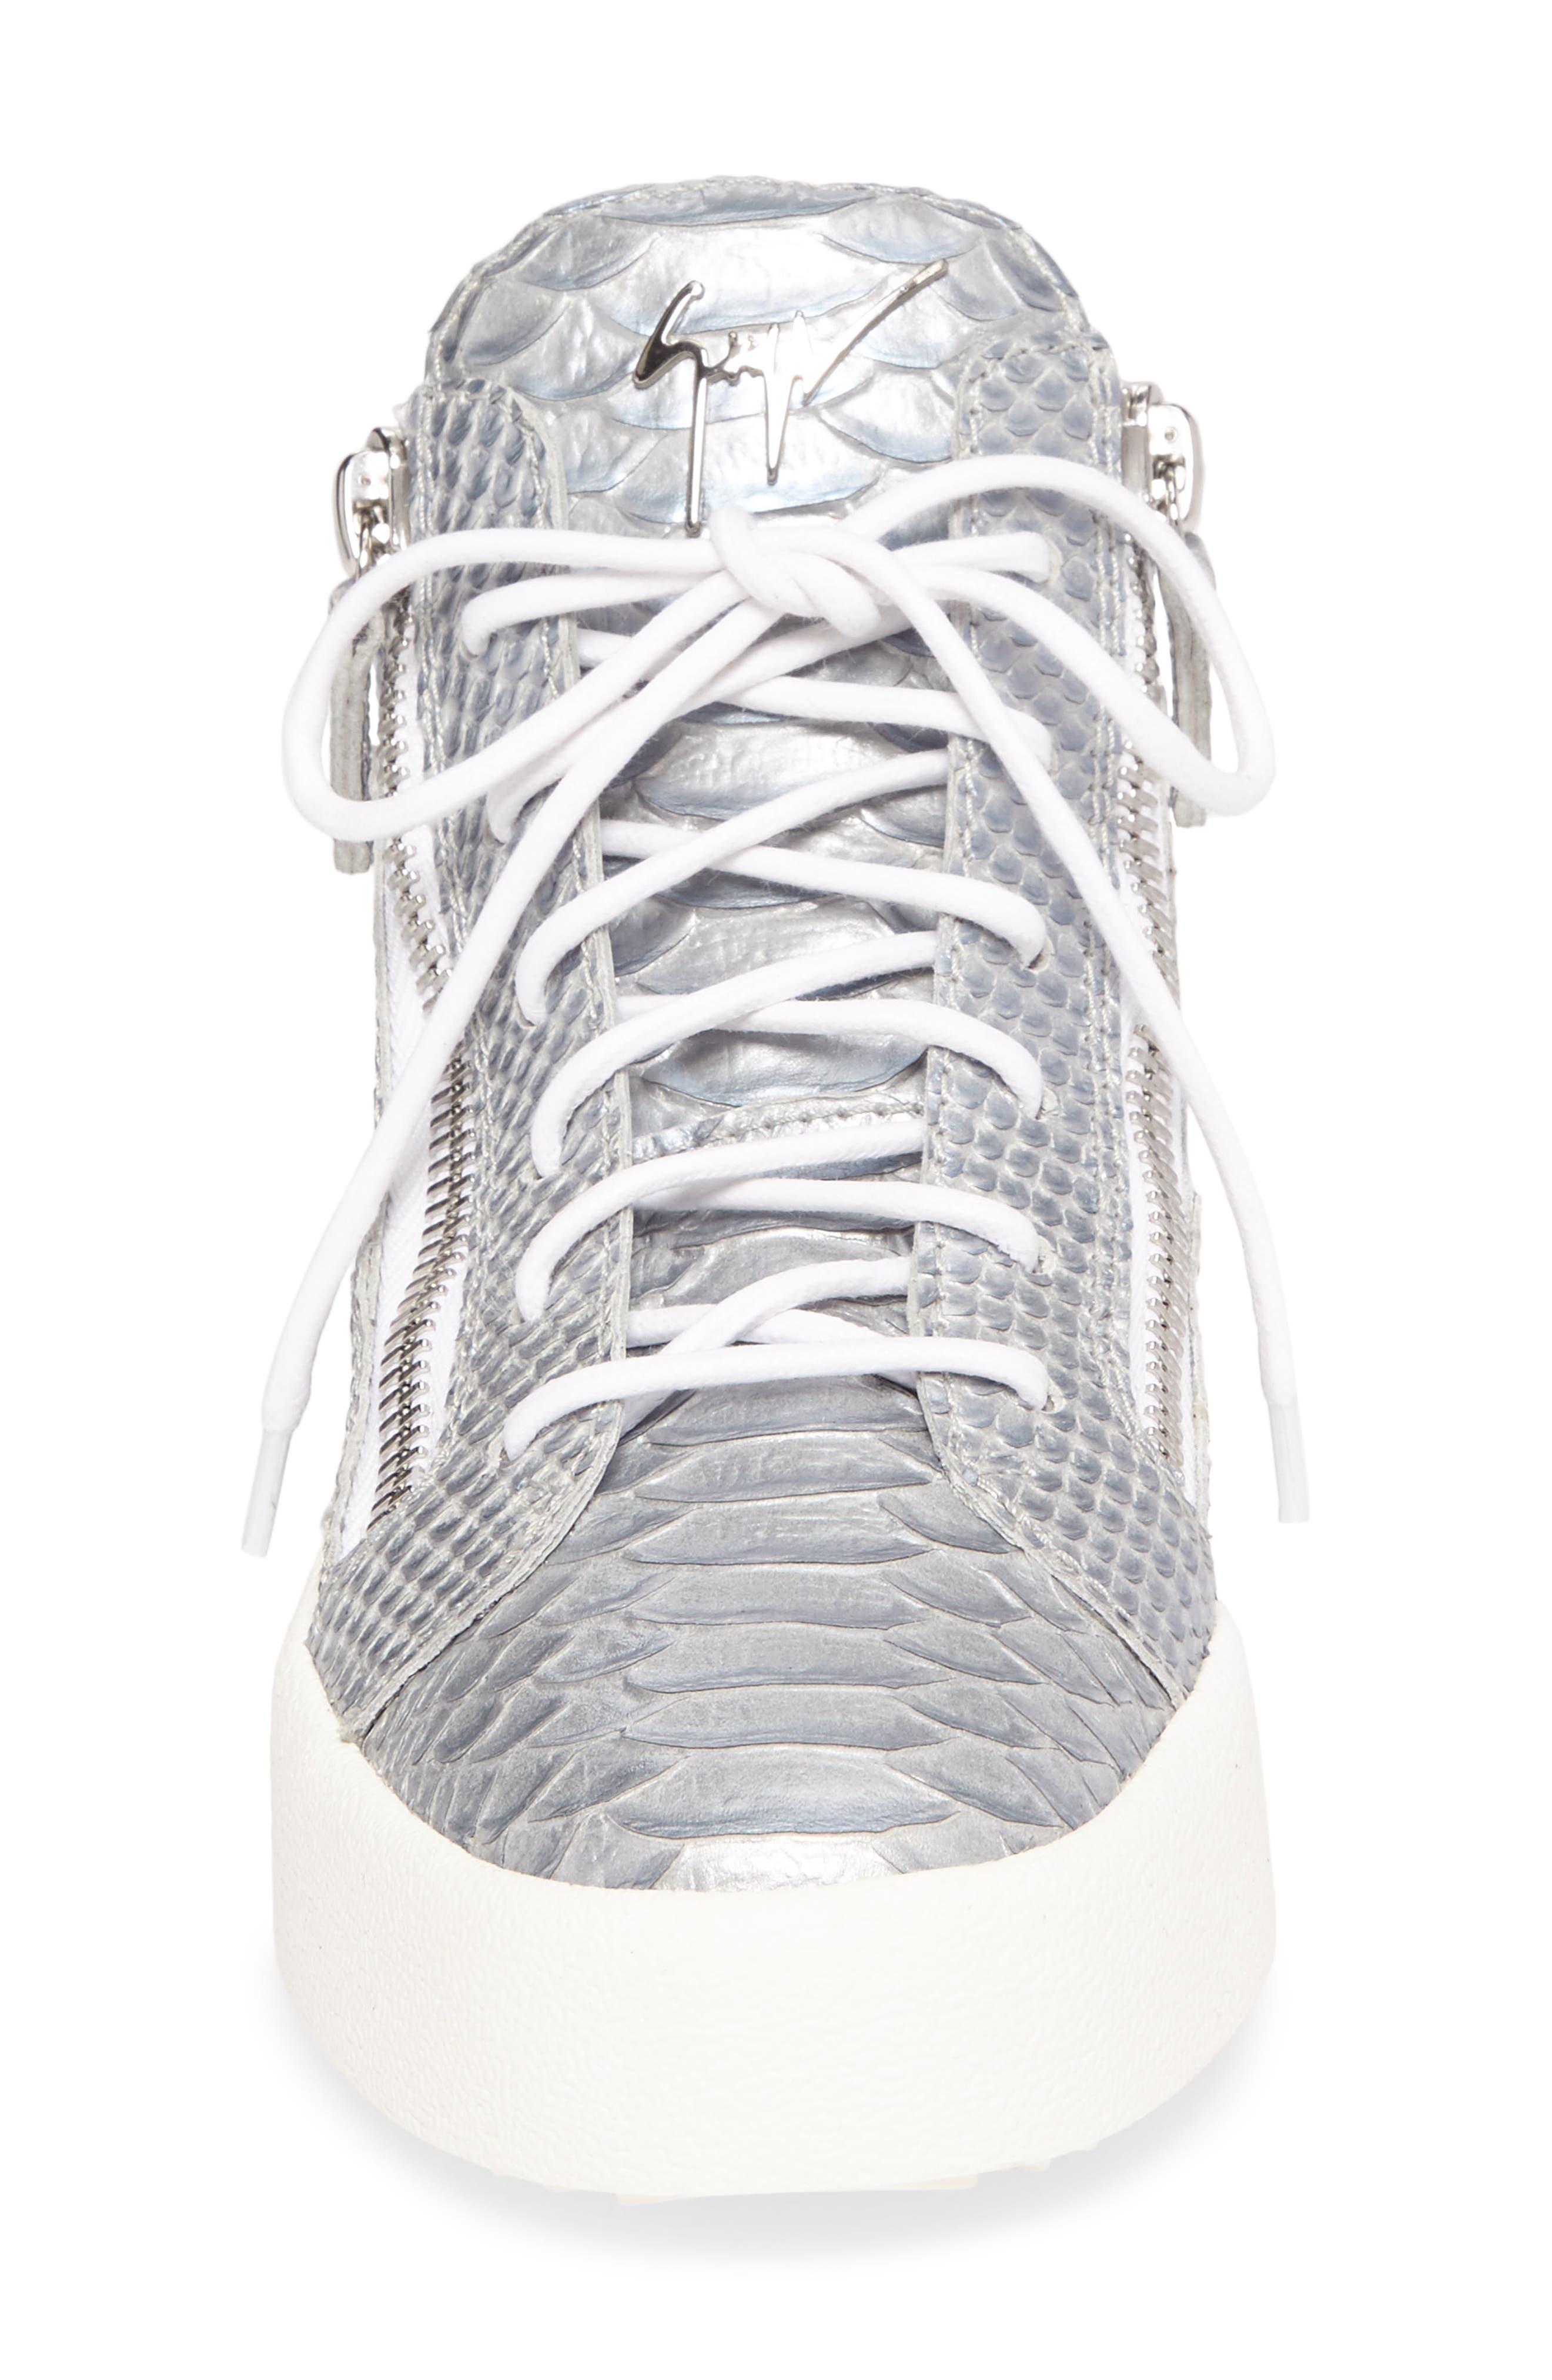 May London Mid Top Sneaker,                             Alternate thumbnail 4, color,                             020